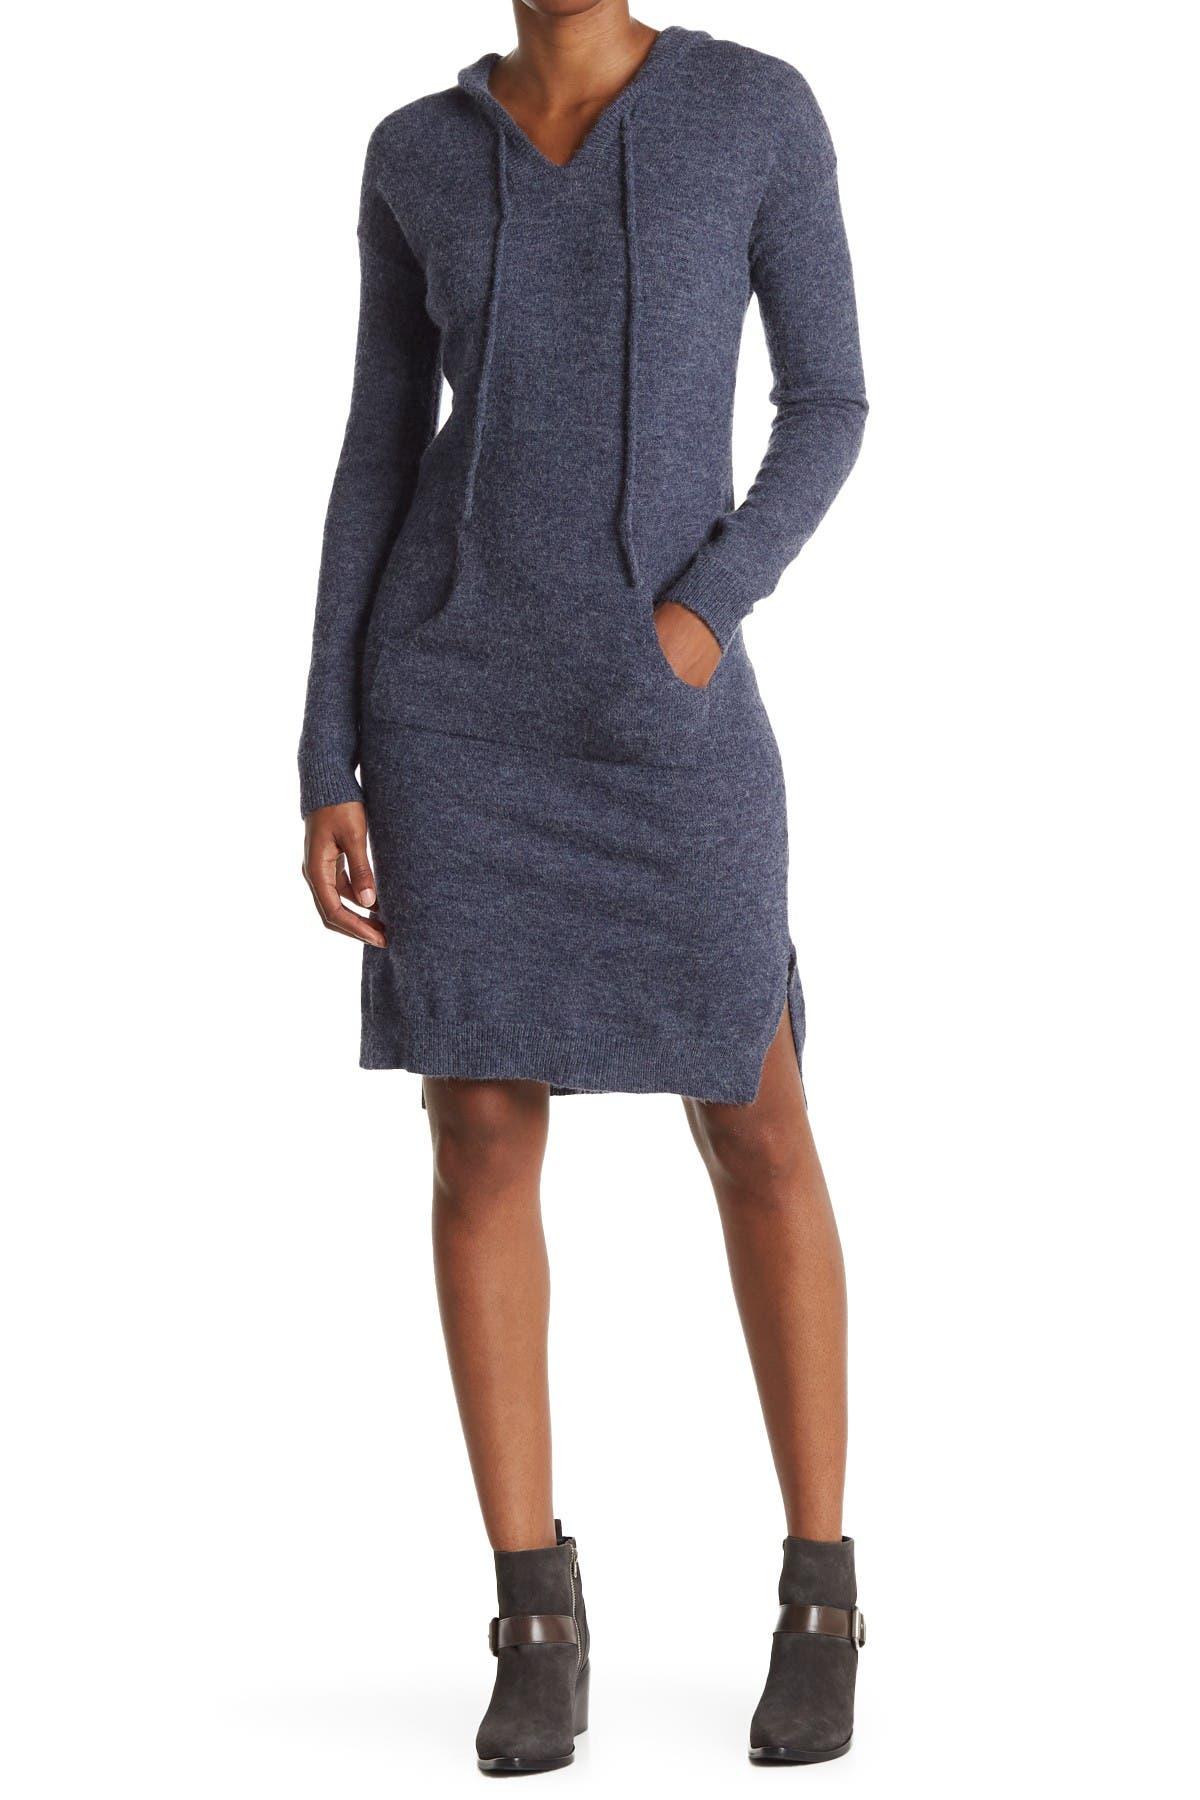 Image of STITCHDROP Joey Hi-Low Midi Hoodie Sweater Dress